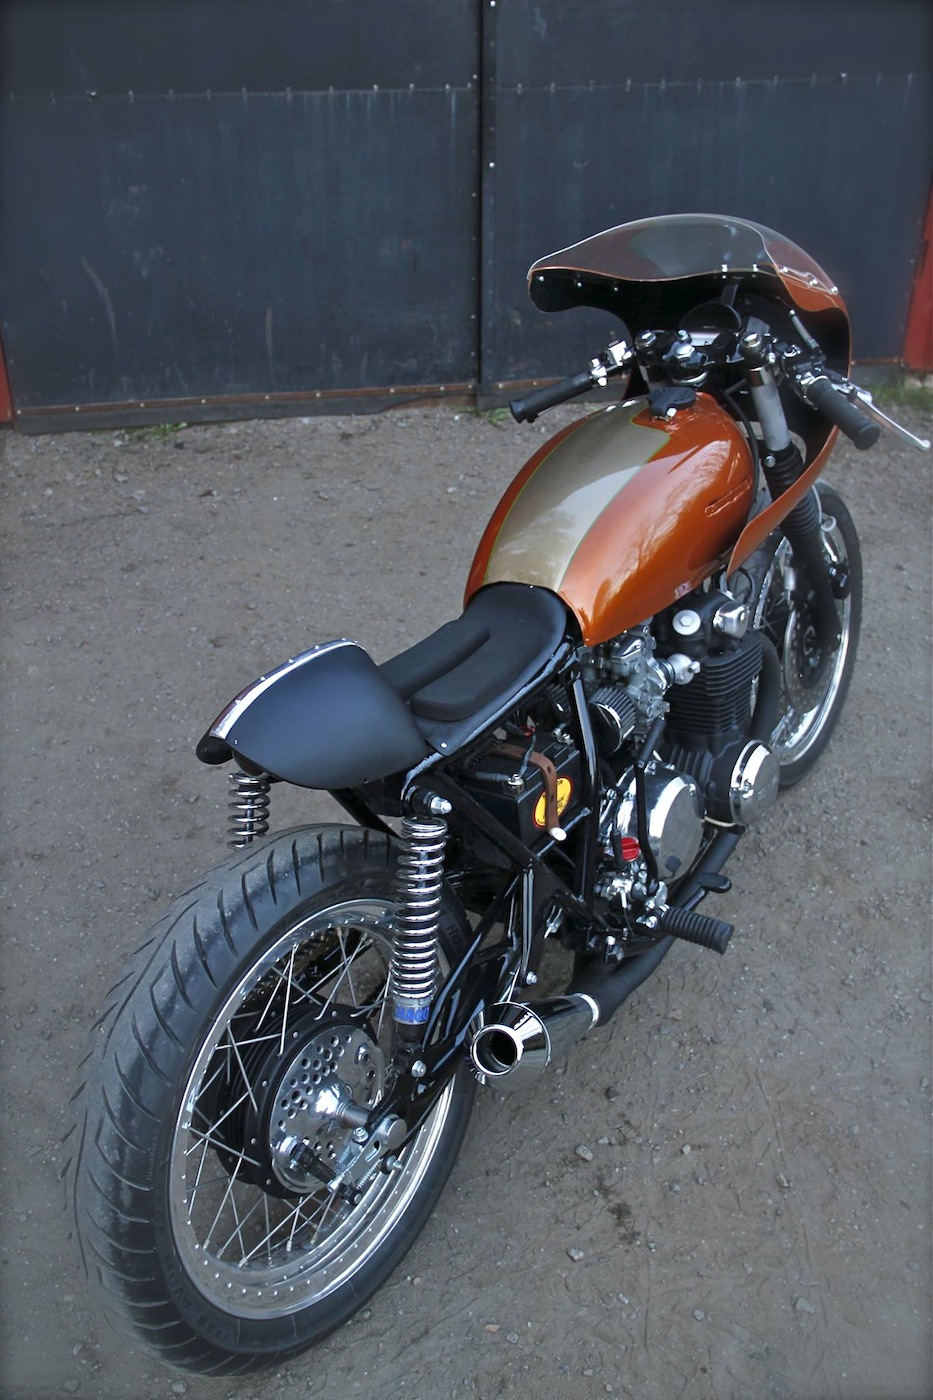 Adam S Cb500 Inazuma Caf 233 Racer